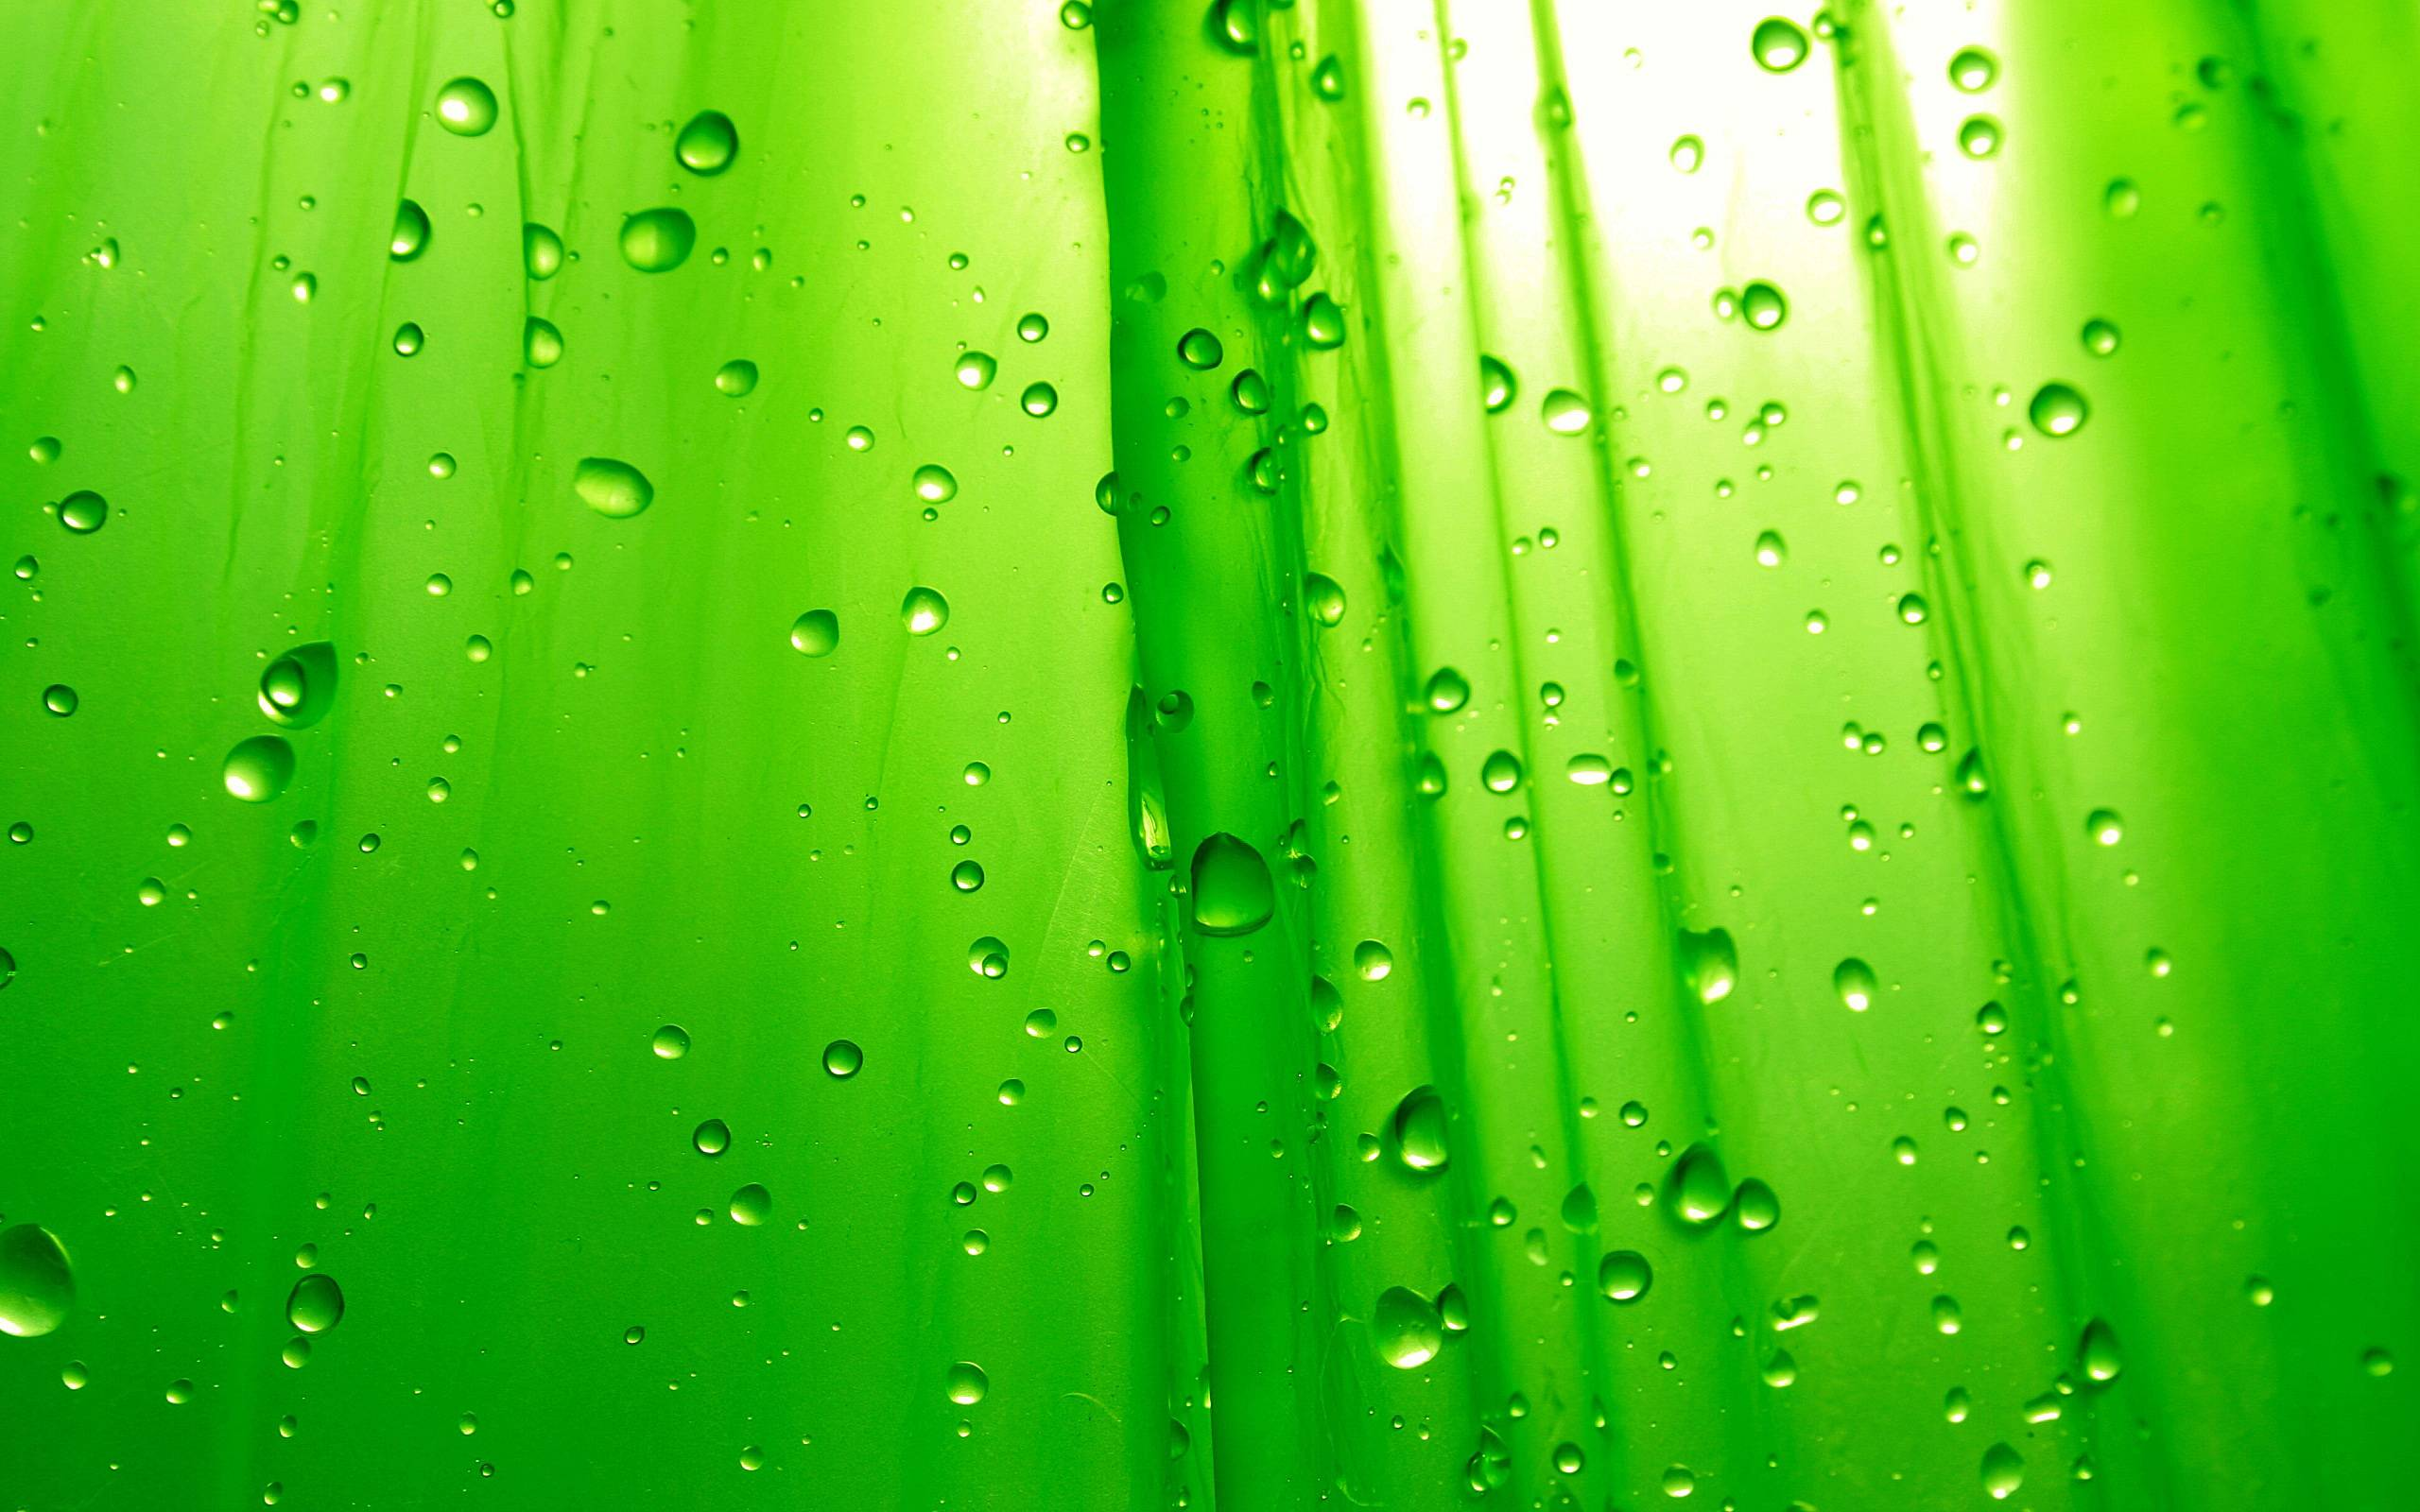 Go Green Wallpaper Free